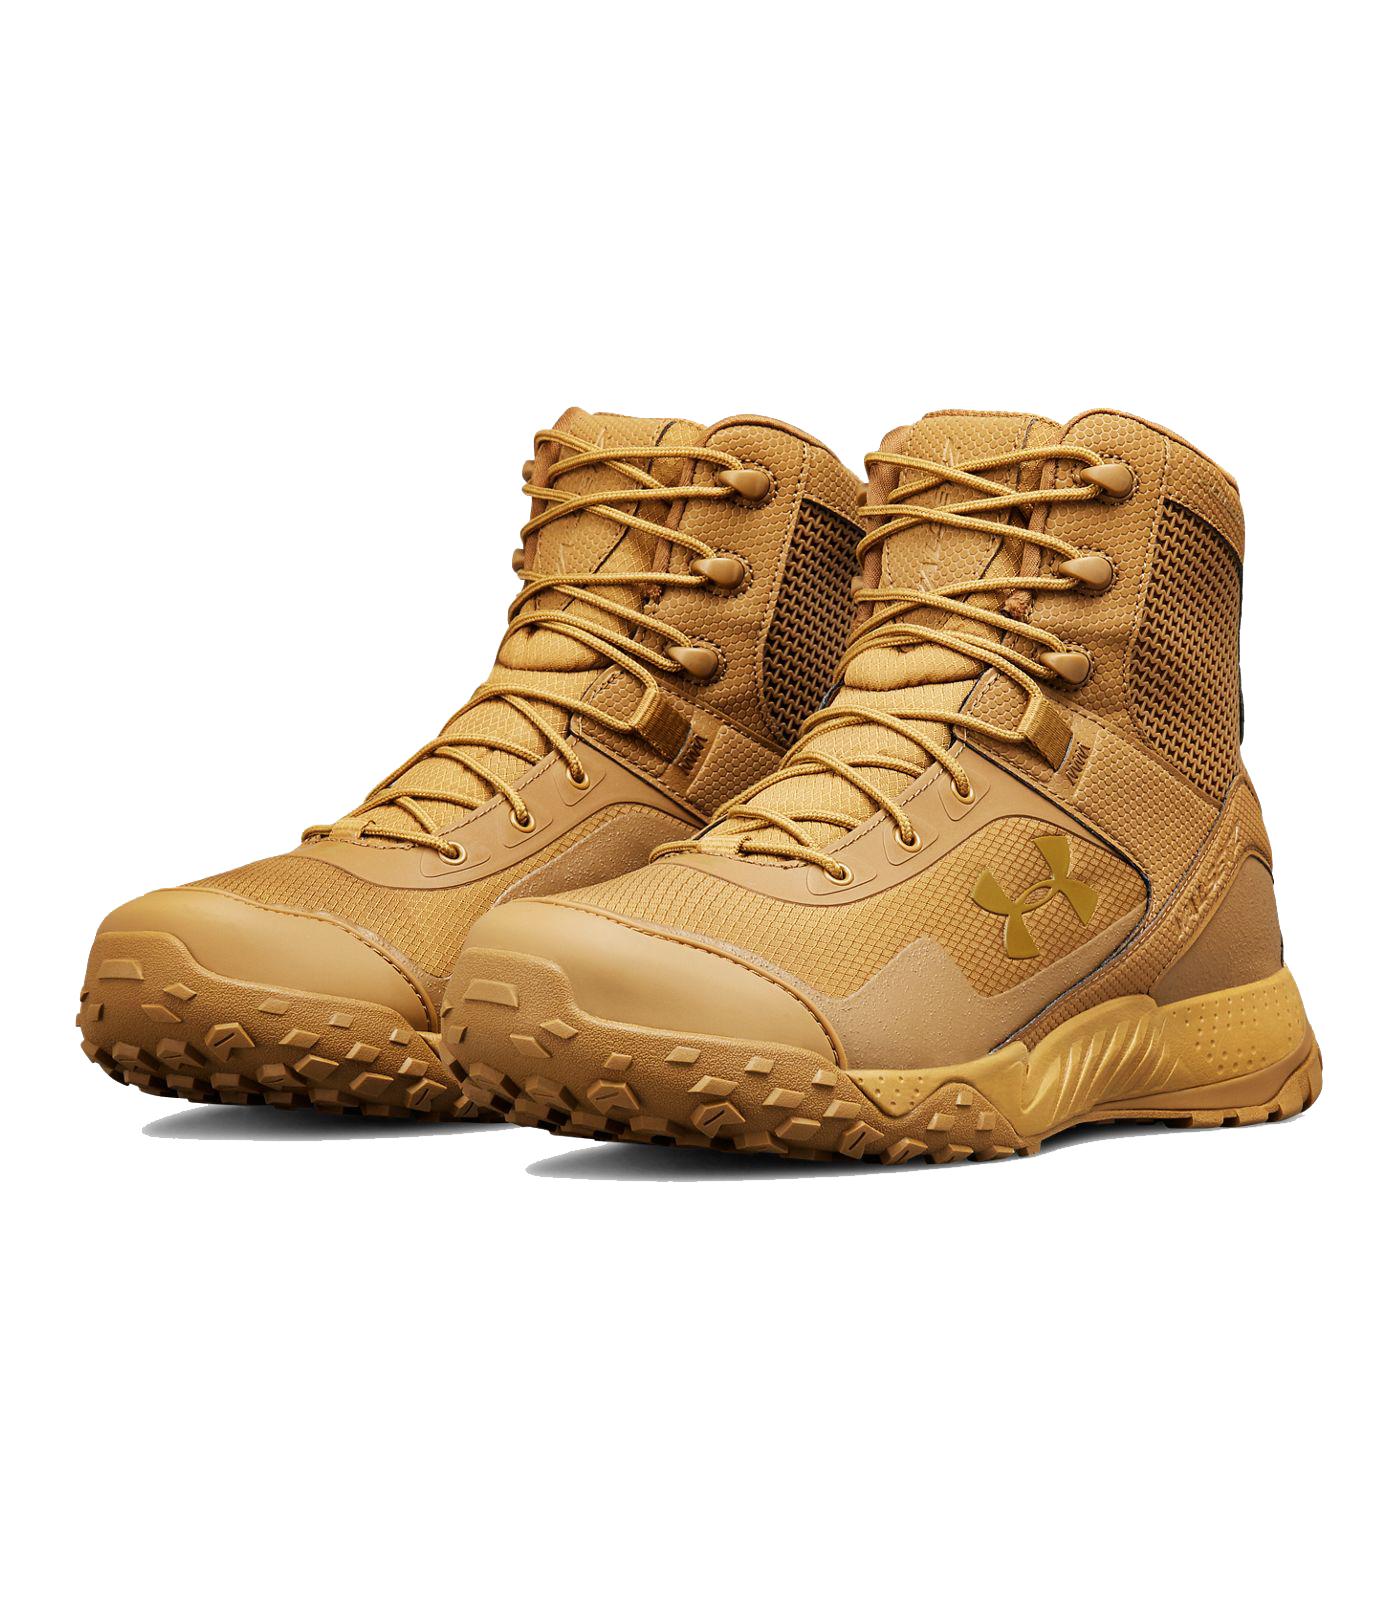 Under-Armour-Men-039-s-UA-Valsetz-RTS-1-5-Tactical-Boots-302103 thumbnail 14